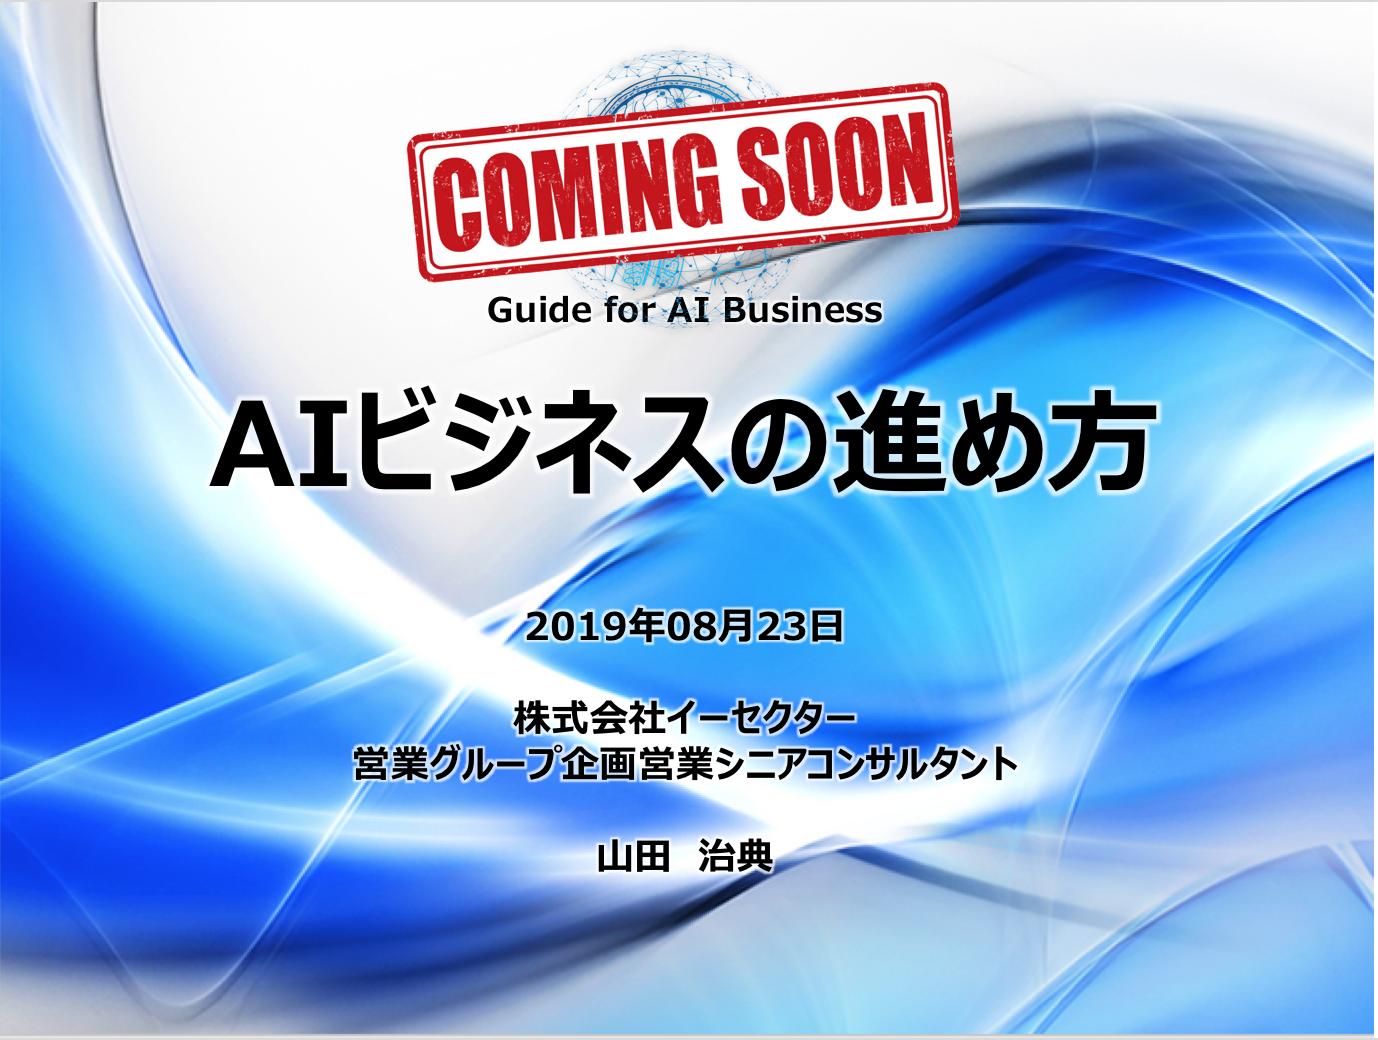 RPA x AI ビジネスの進め方